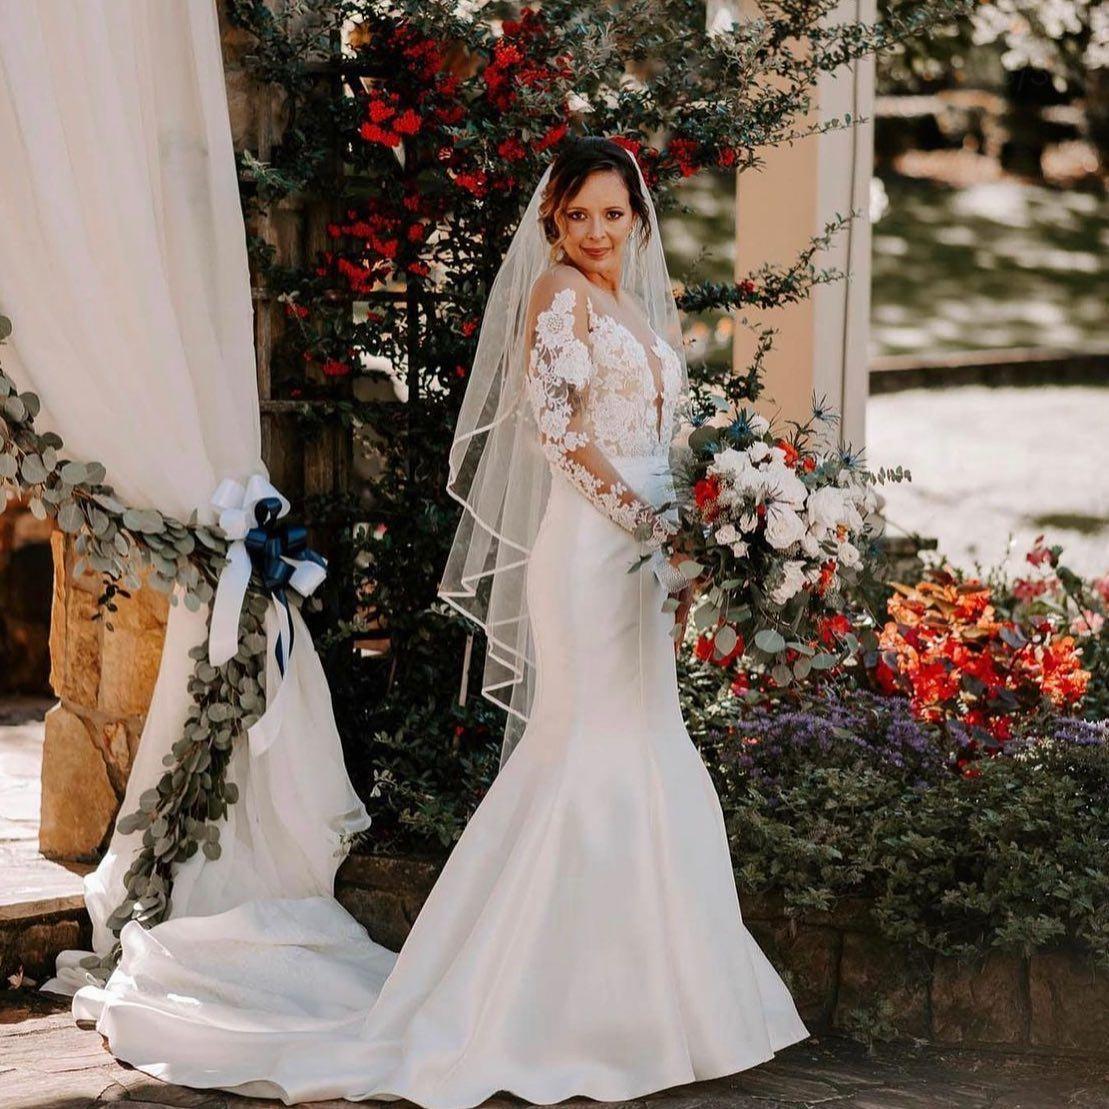 Gorgeous Bride at Glendalough Manor